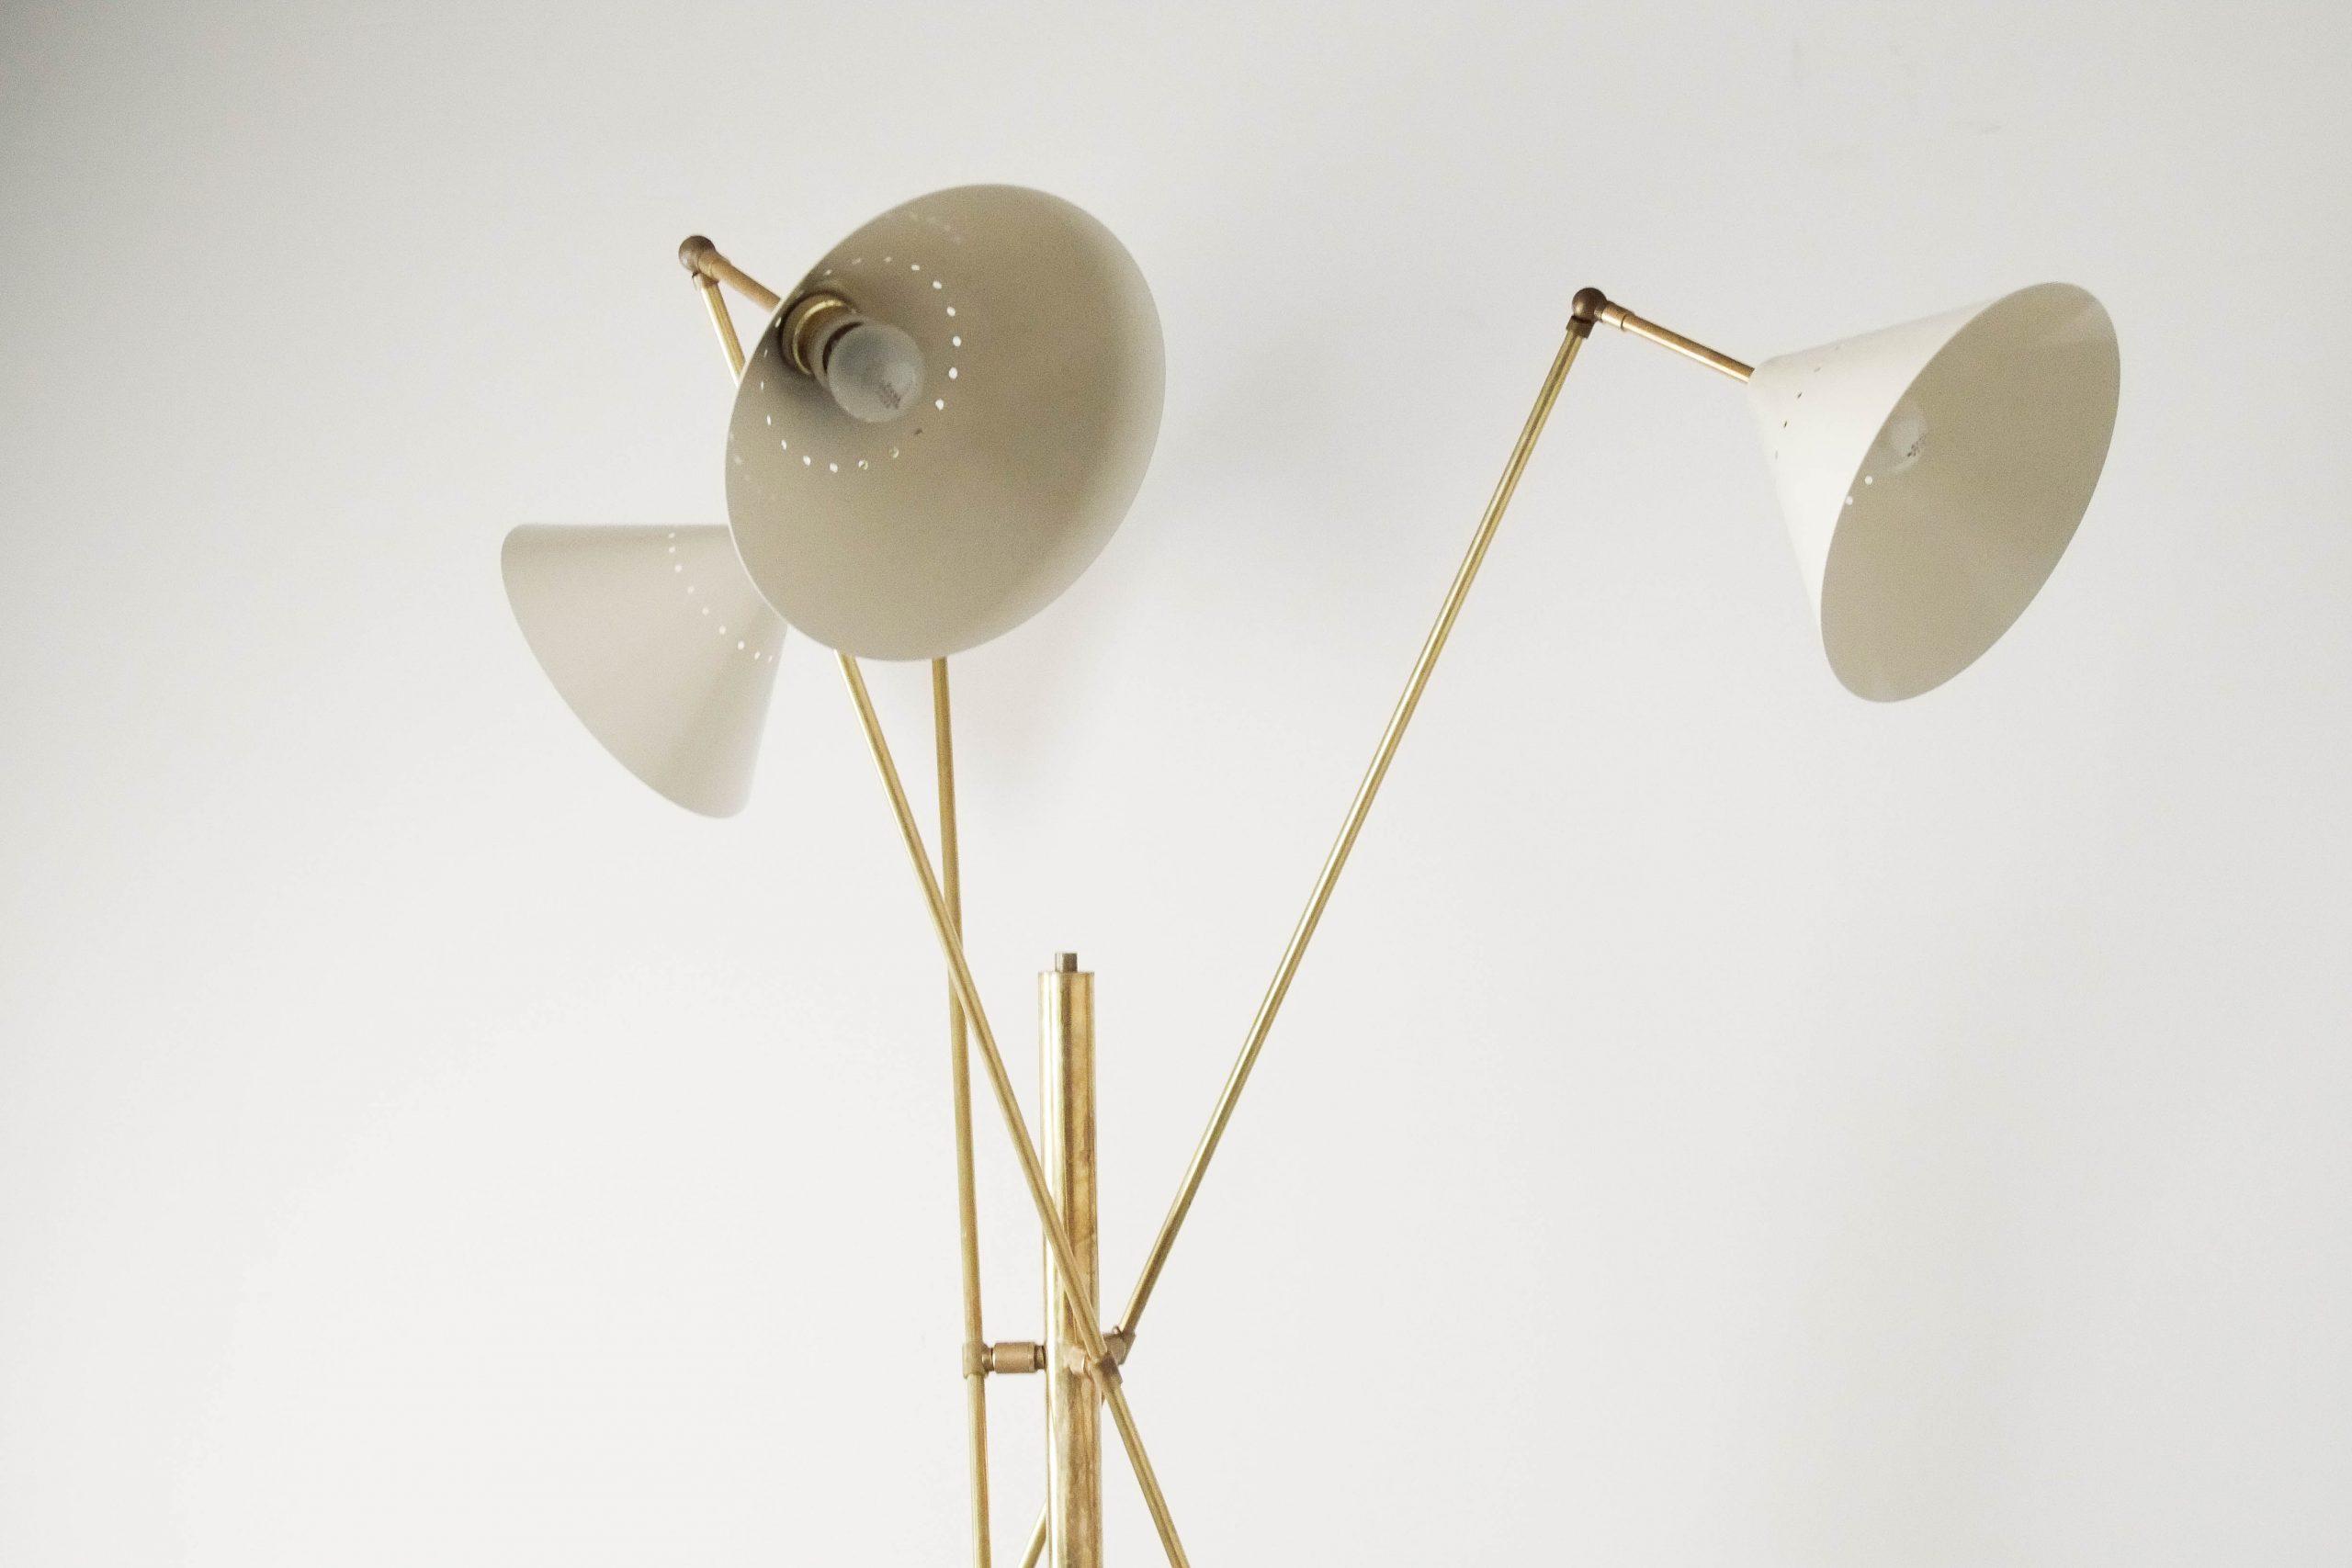 lampara de pie de diseño stilnovo de laton metal calidad italia